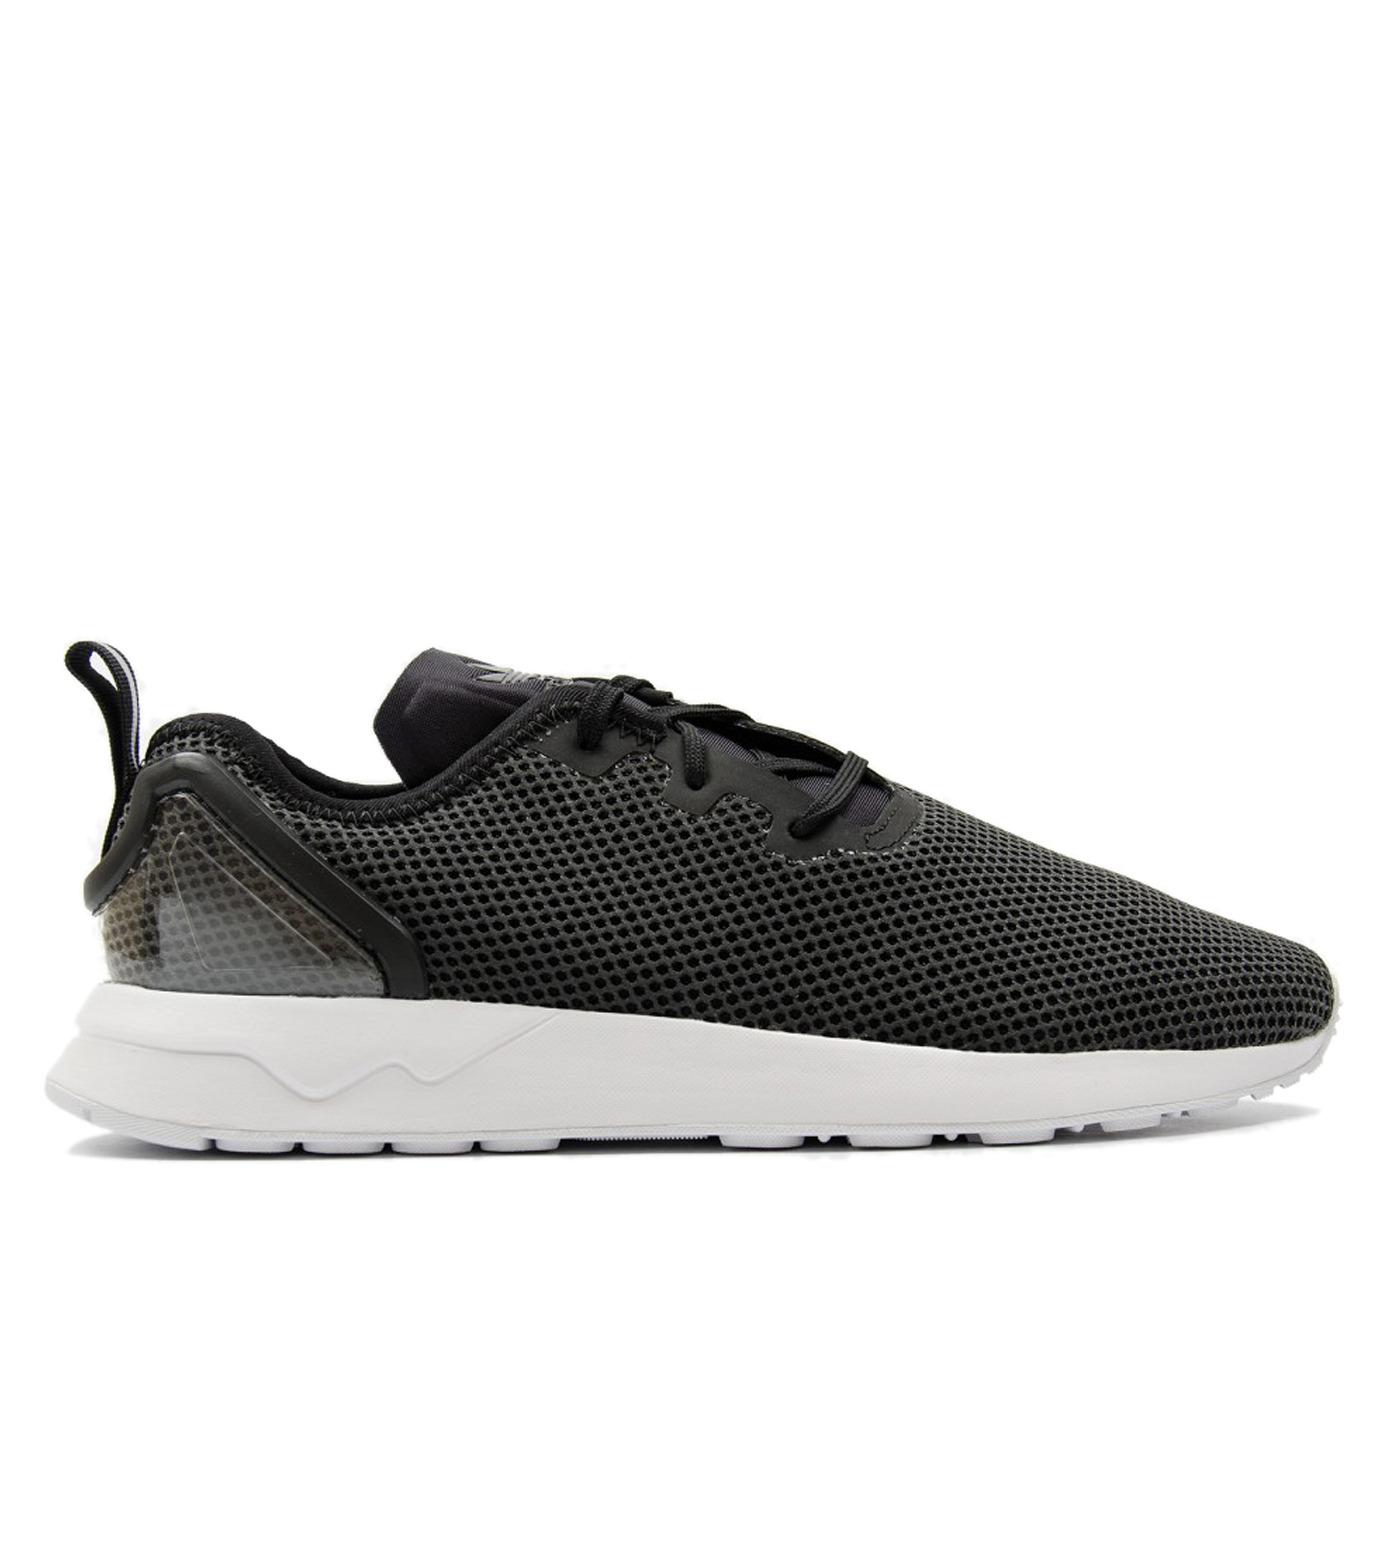 adidas(アディダス)のZX FLUX RCASYM-BLACK(シューズ/shoes)-S79050-13 拡大詳細画像1